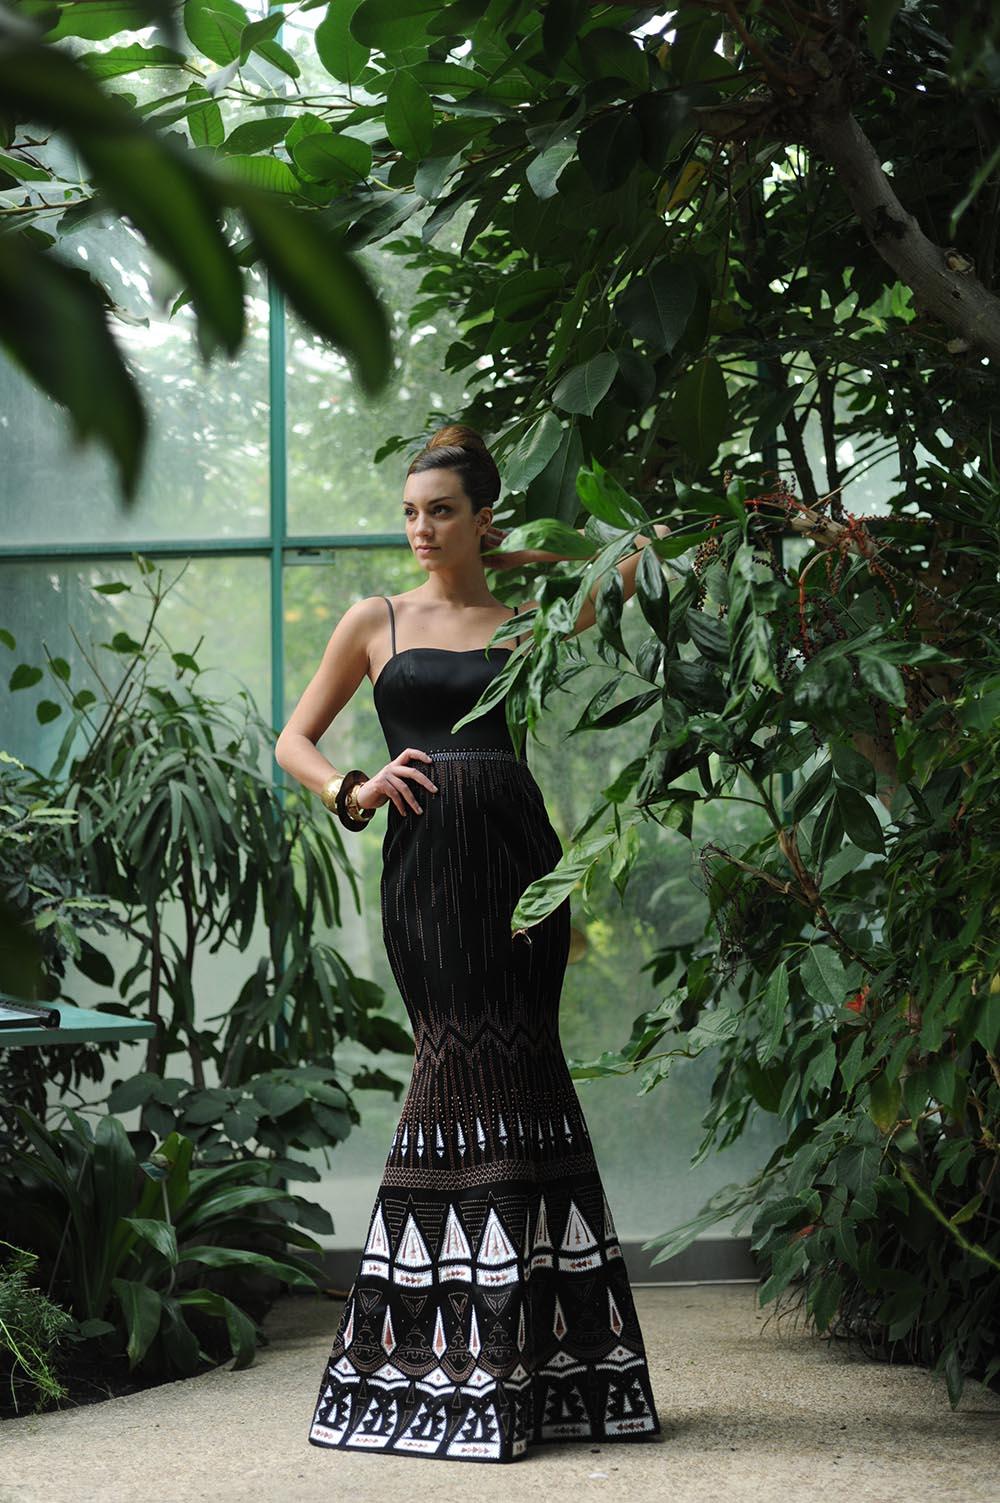 black-long-dress-evening-gown-embroidered-mermaid-cut.JPG